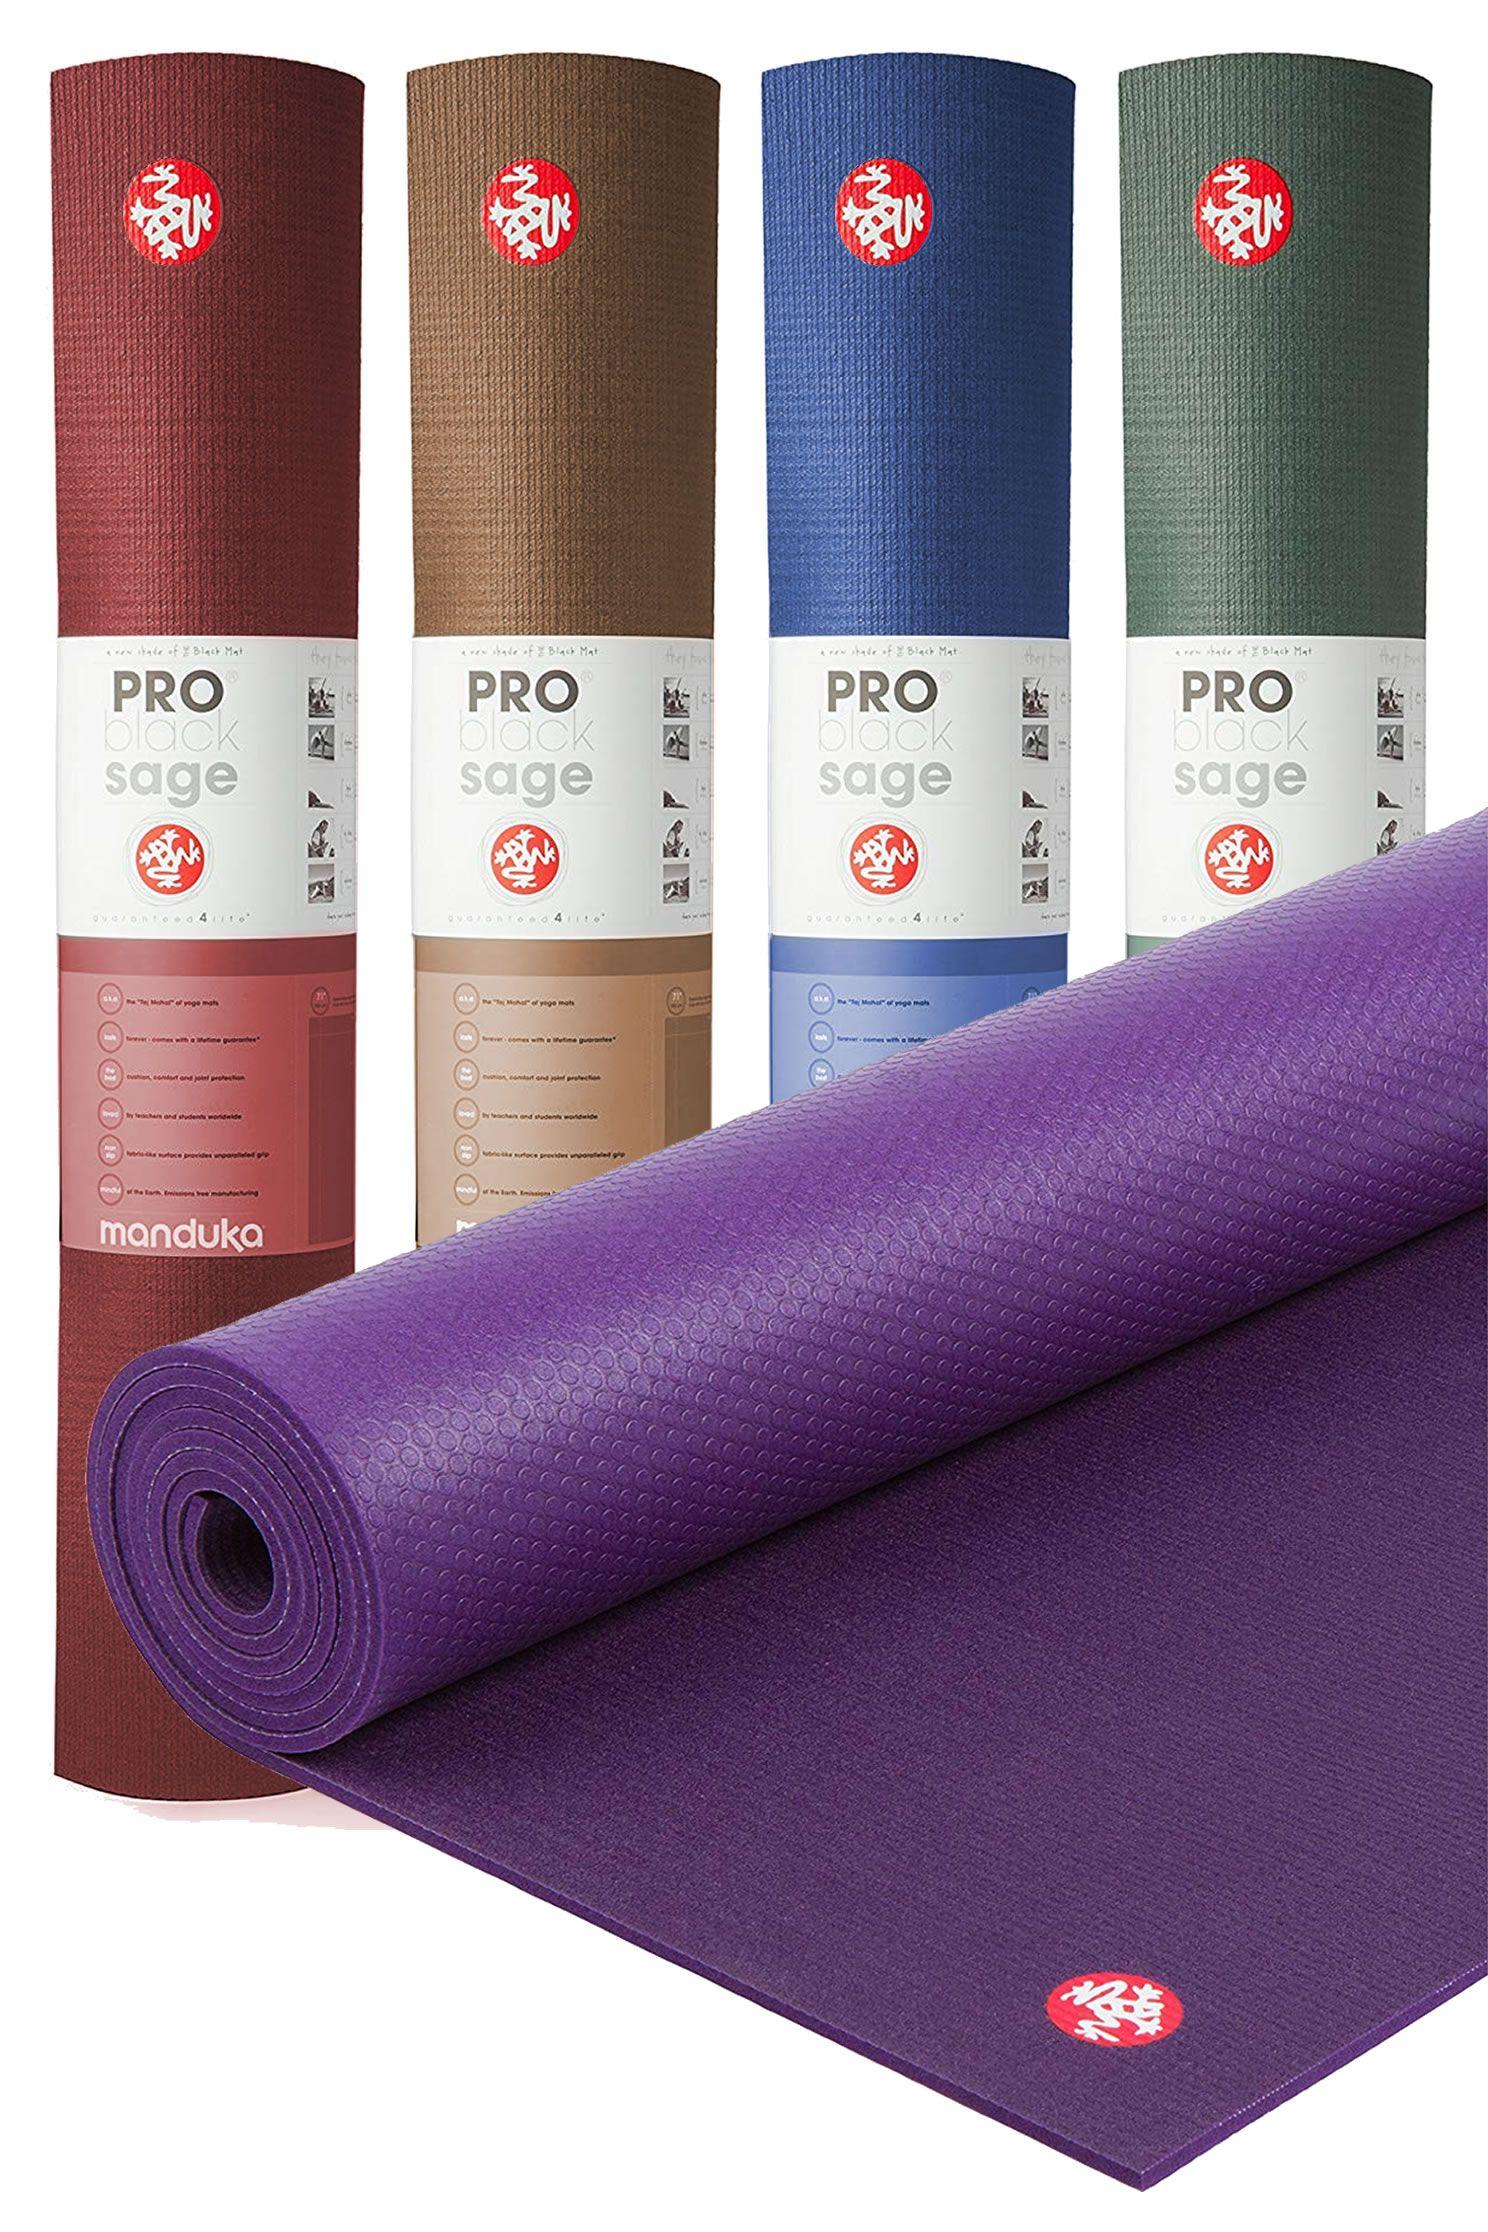 Manduka Pro Eco Friendly Yoga Mat In 2020 Eco Friendly Yoga Mats Thick Yoga Mats Yoga Mat